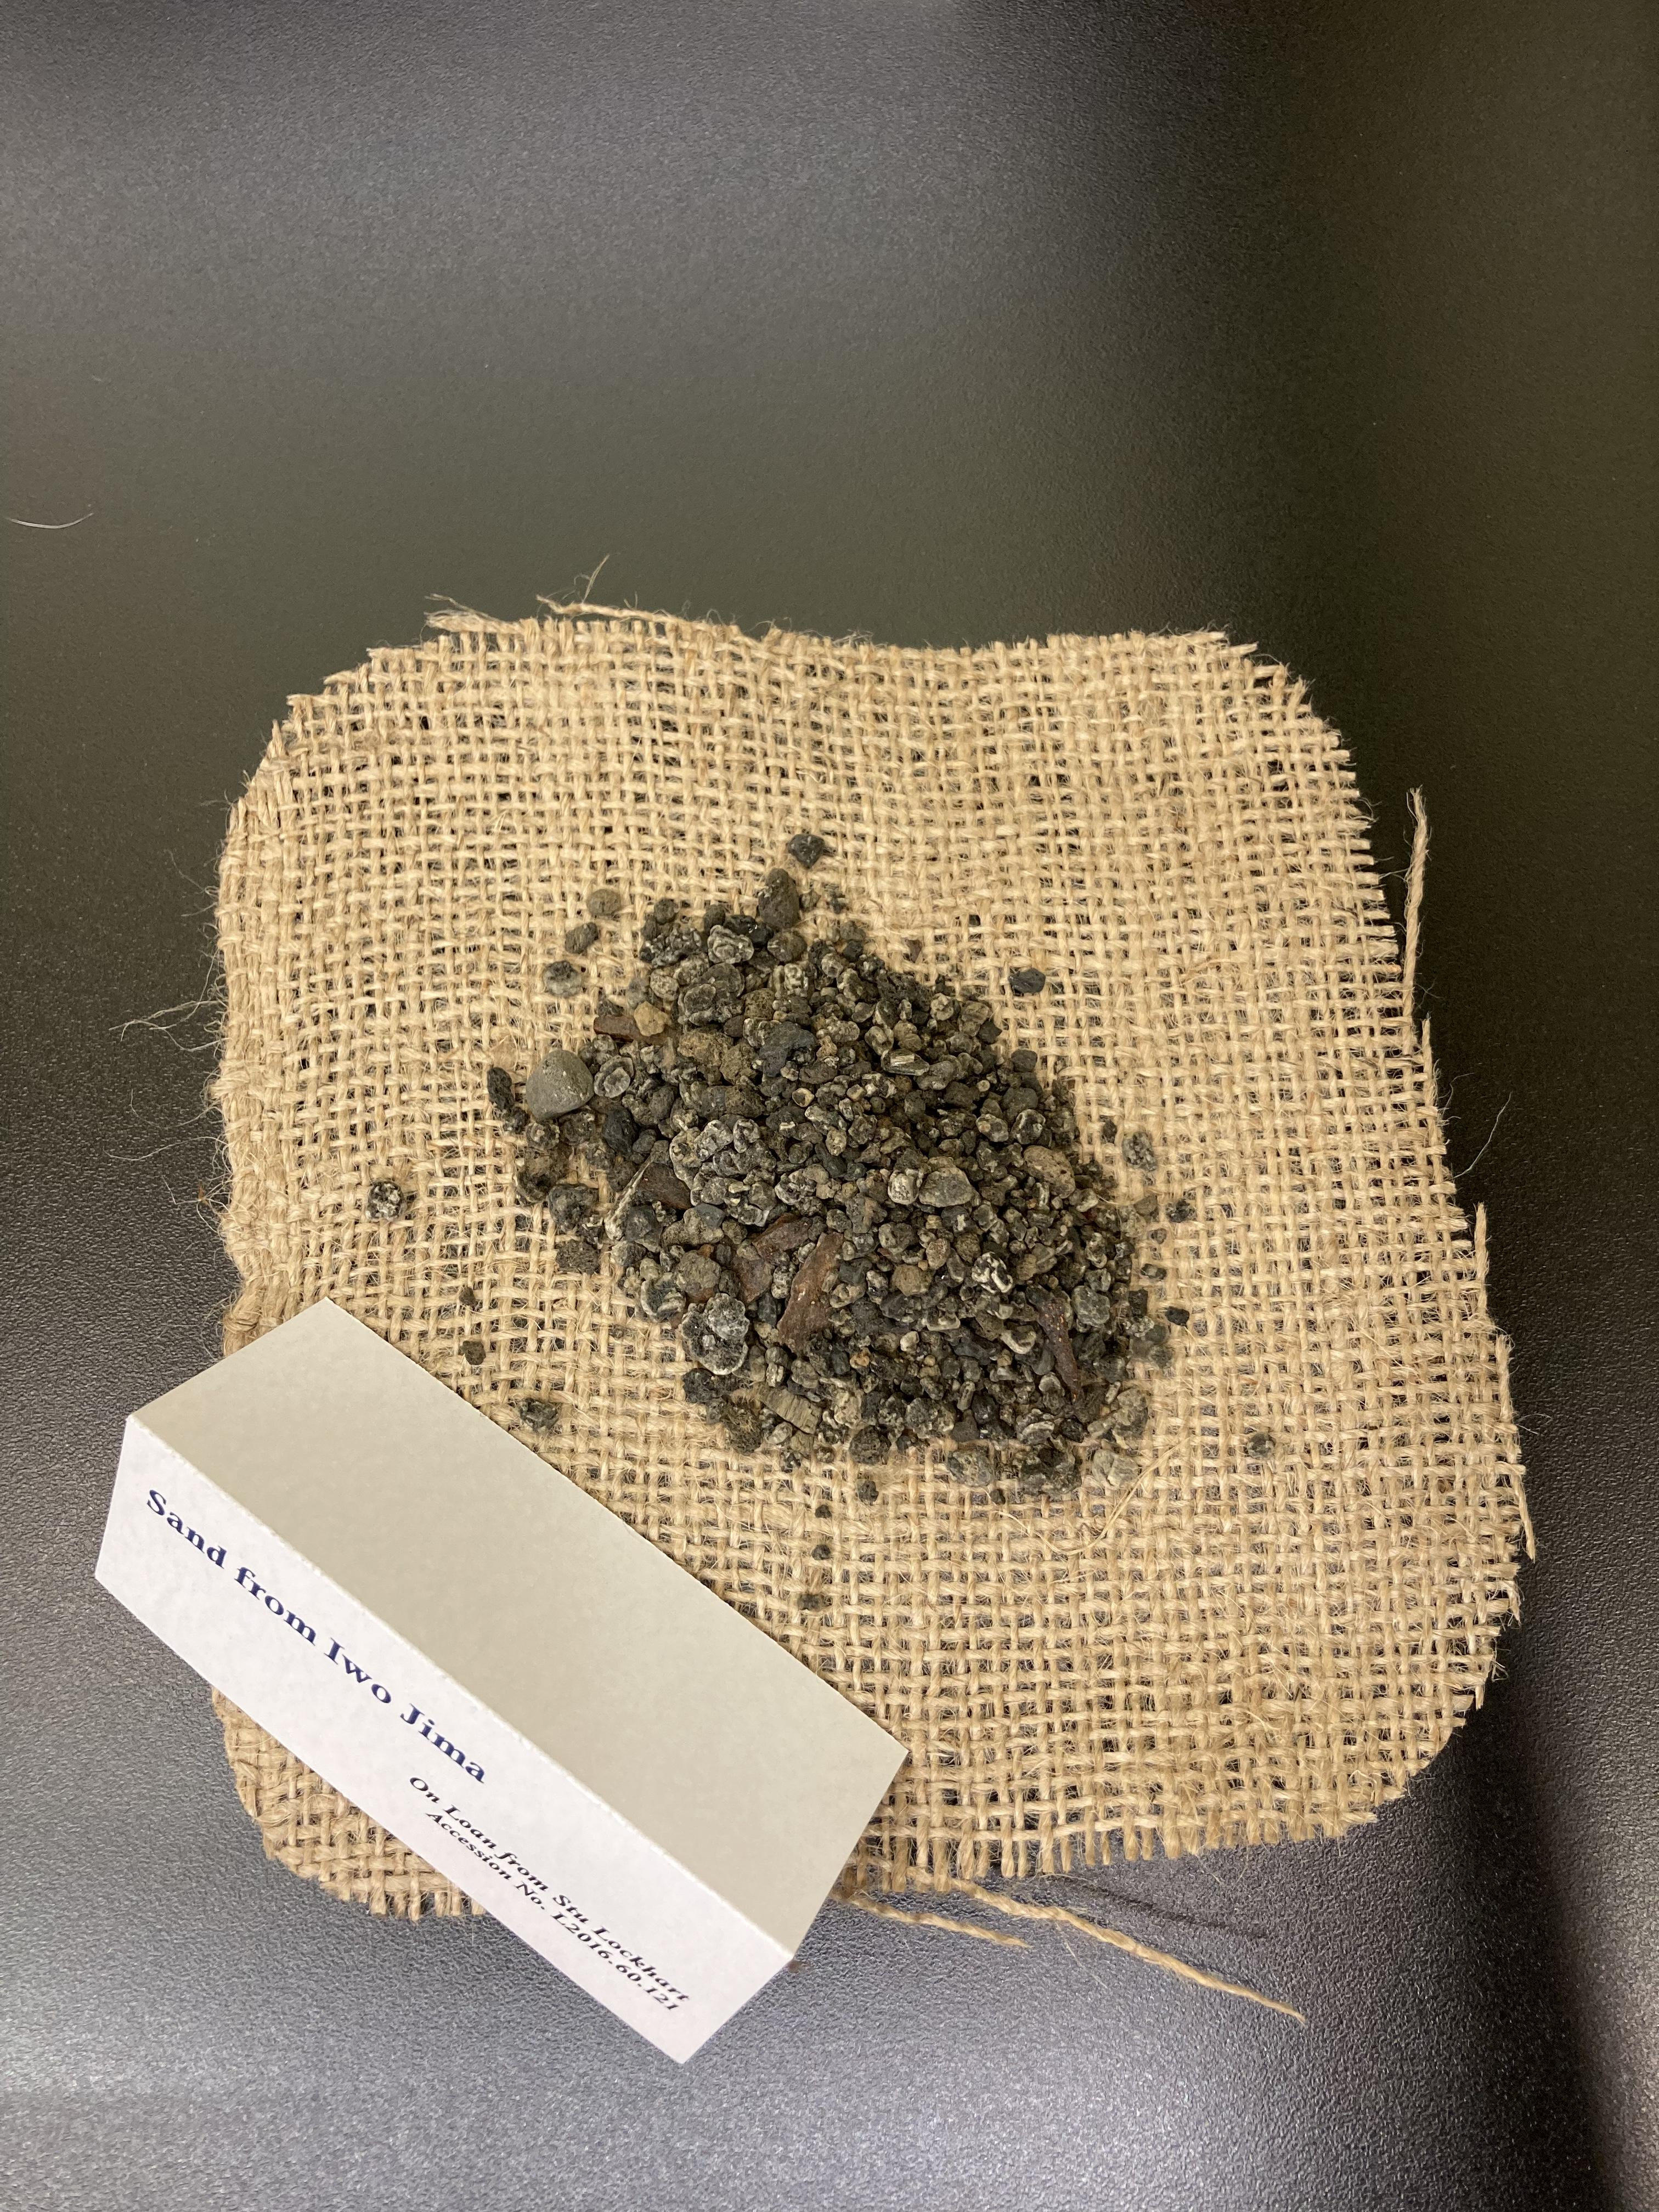 Sand from Iwo Jima, on cloth napkin.